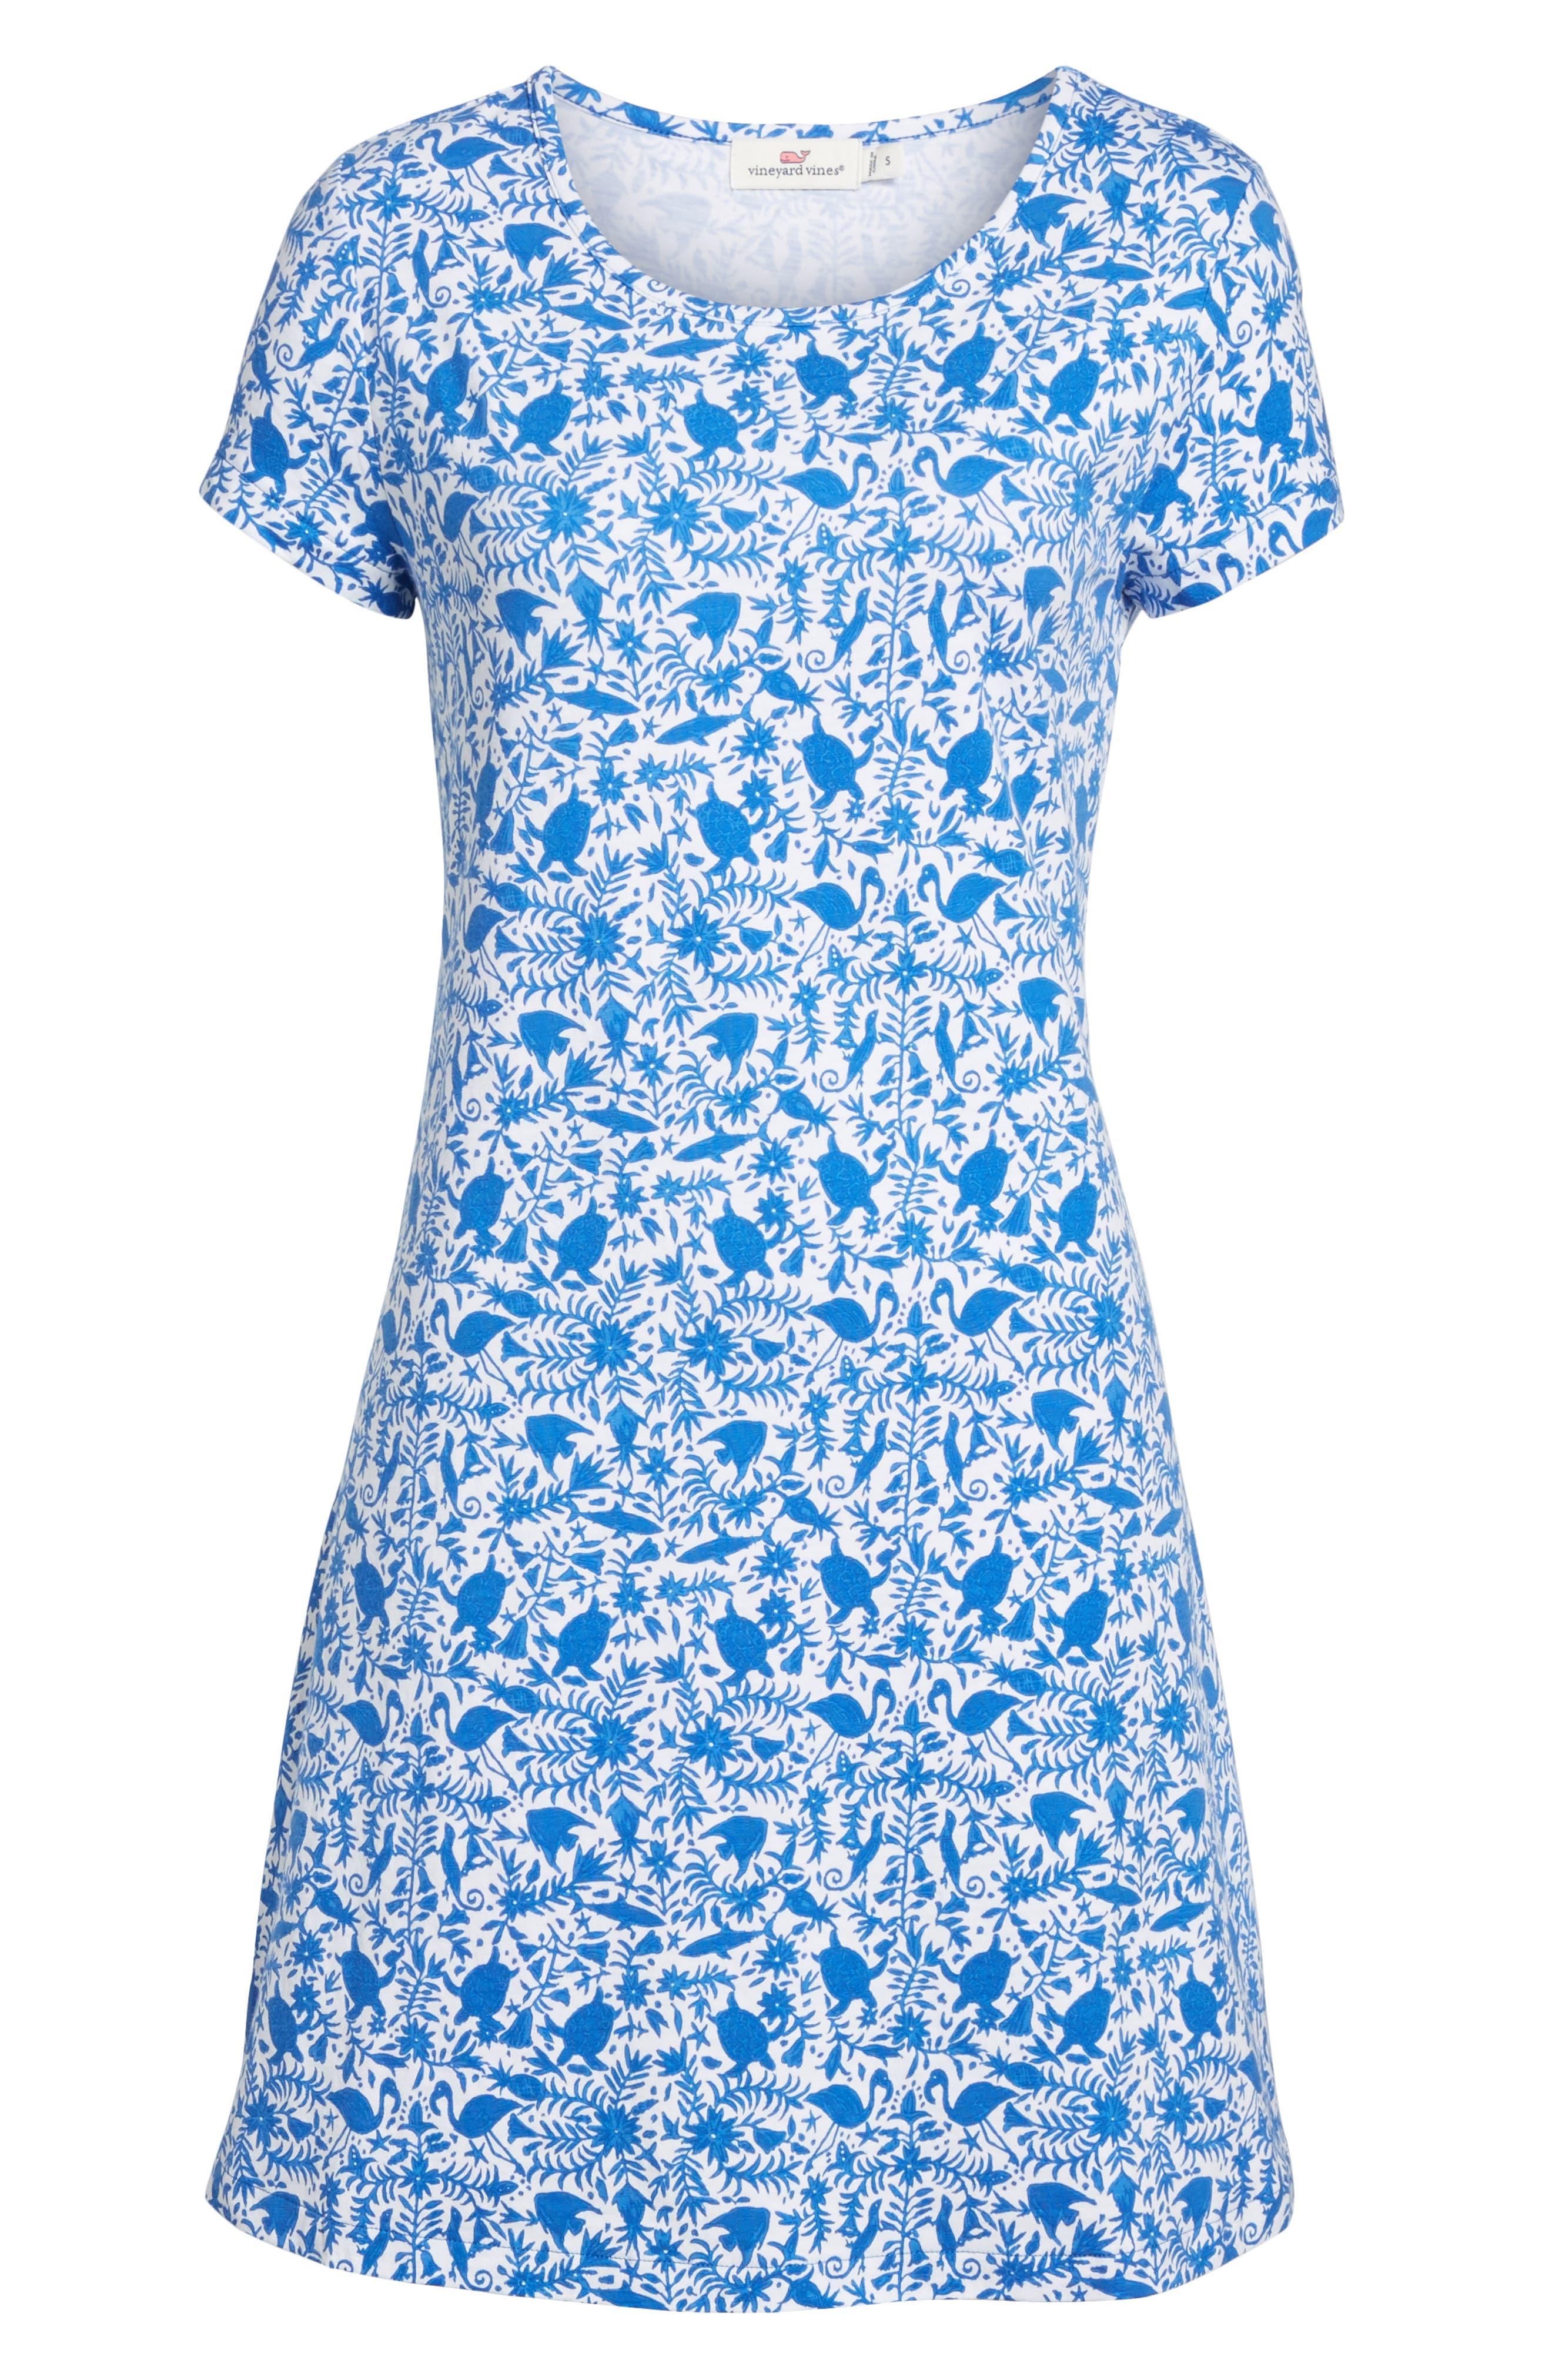 Bahamas Otomi Print Stretch Cotton Dress,                             Alternate thumbnail 6, color,                             Yacht Blue